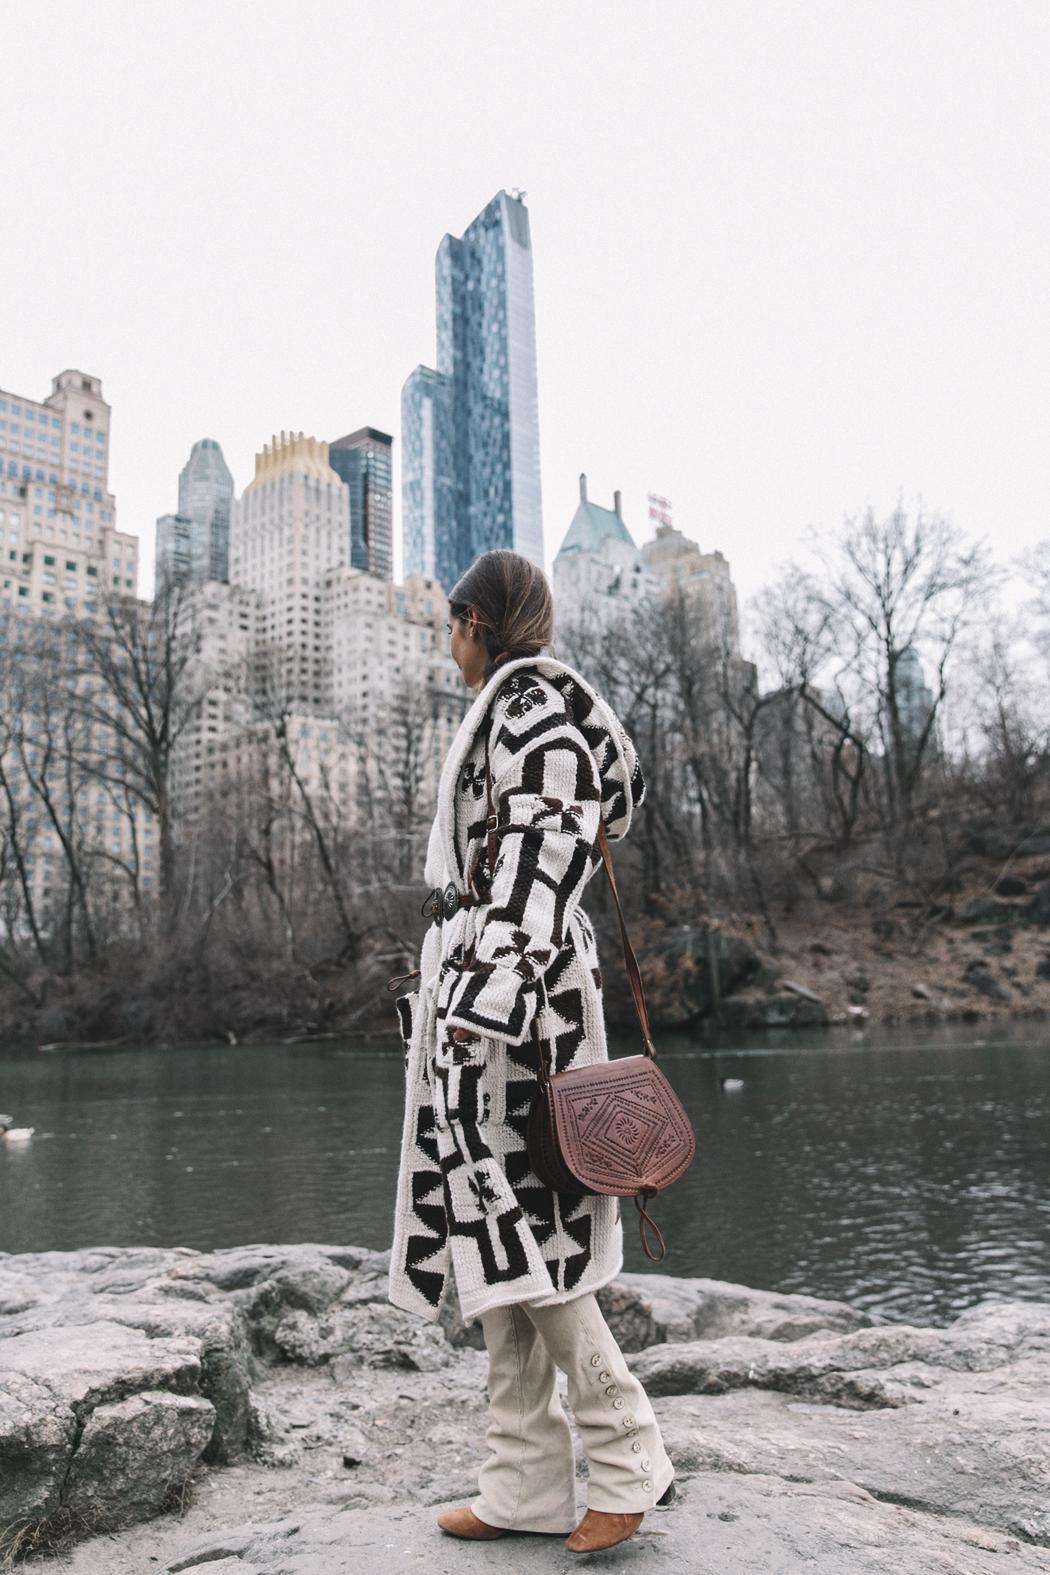 Polo_Ralph_Lauren_Collage_Vintage-Street_Style-NYFW-New_York_Fashion_Week-Knit_Jacket-Cream_Trousers-Boho-Winter_White-20